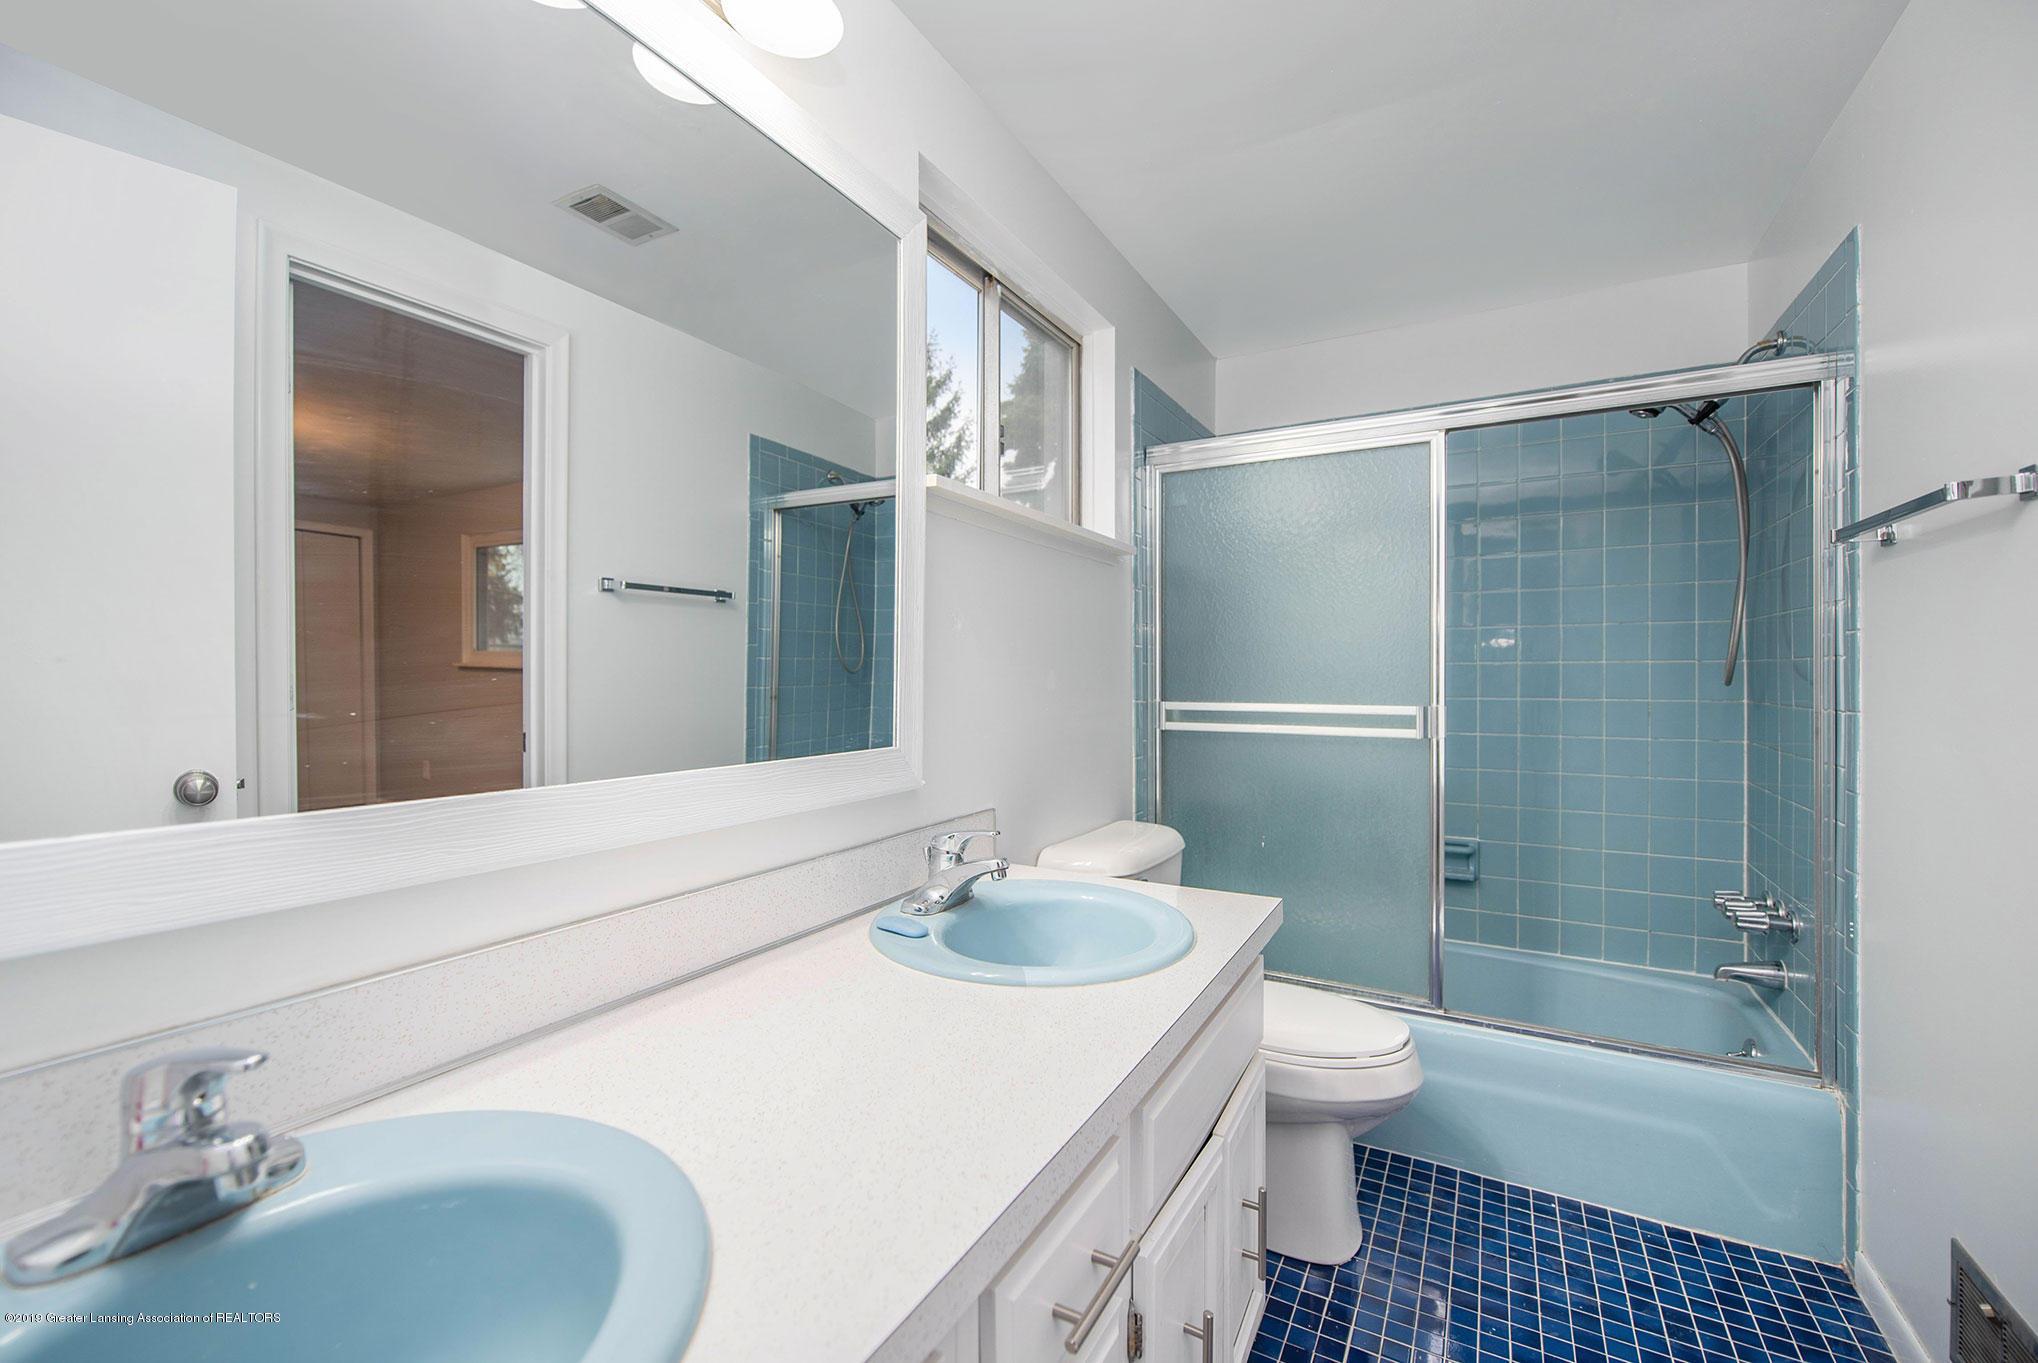 801 Merrill Ave - Bathroom - 14